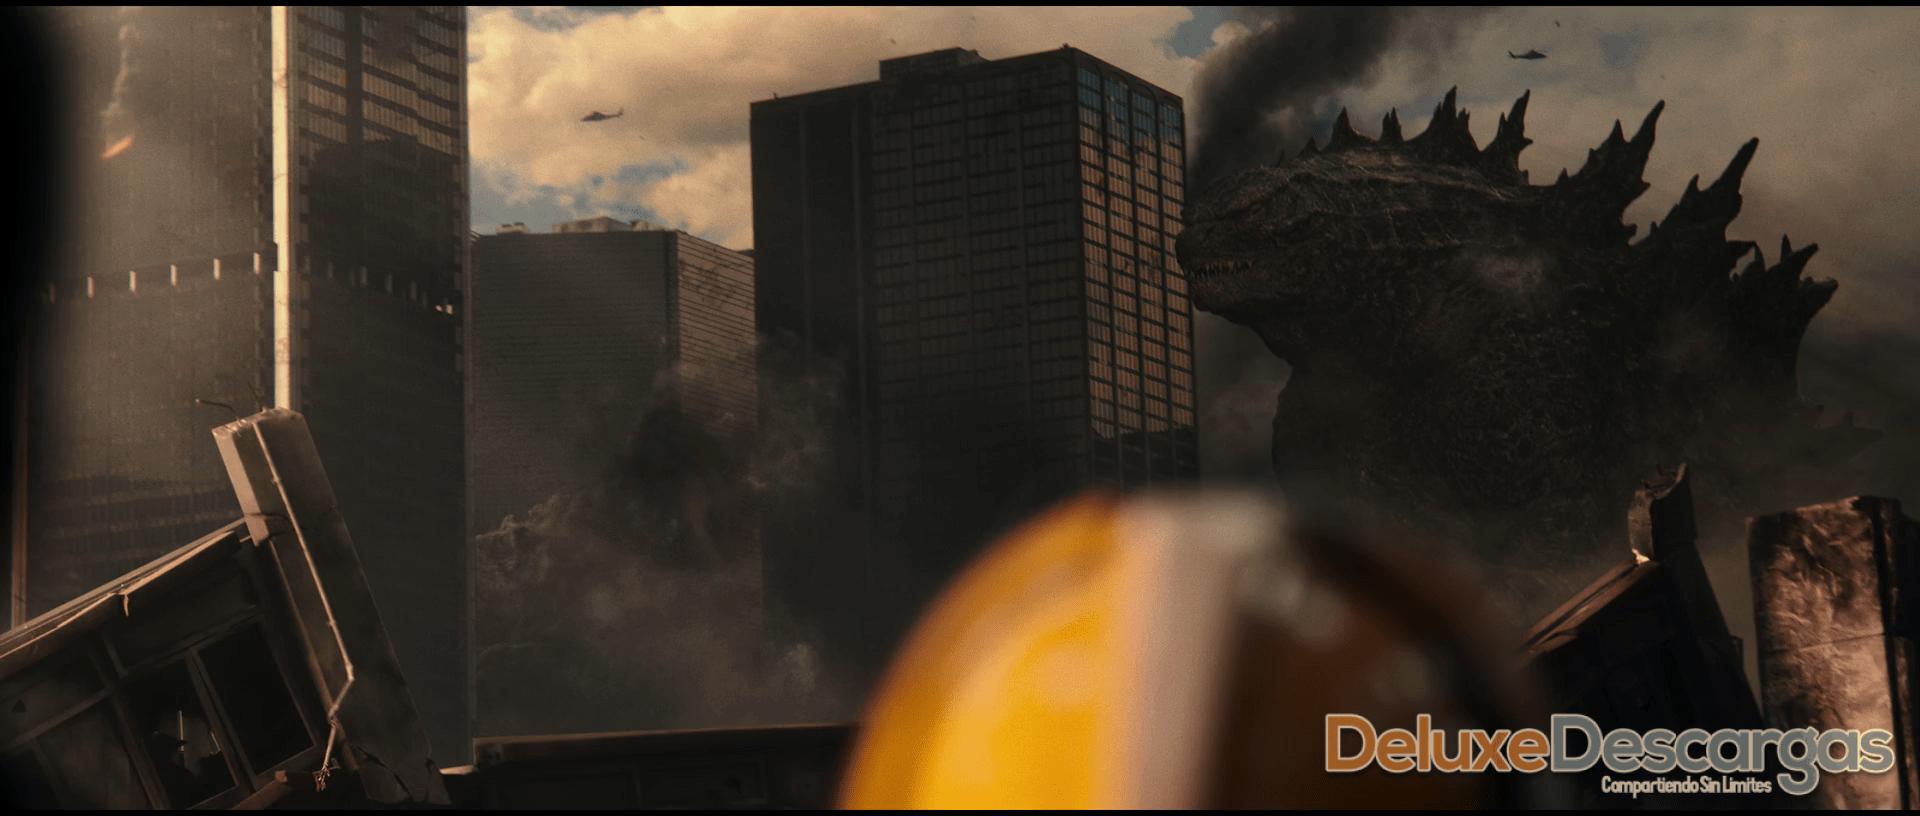 Godzilla vs Kong 1080p (11) min